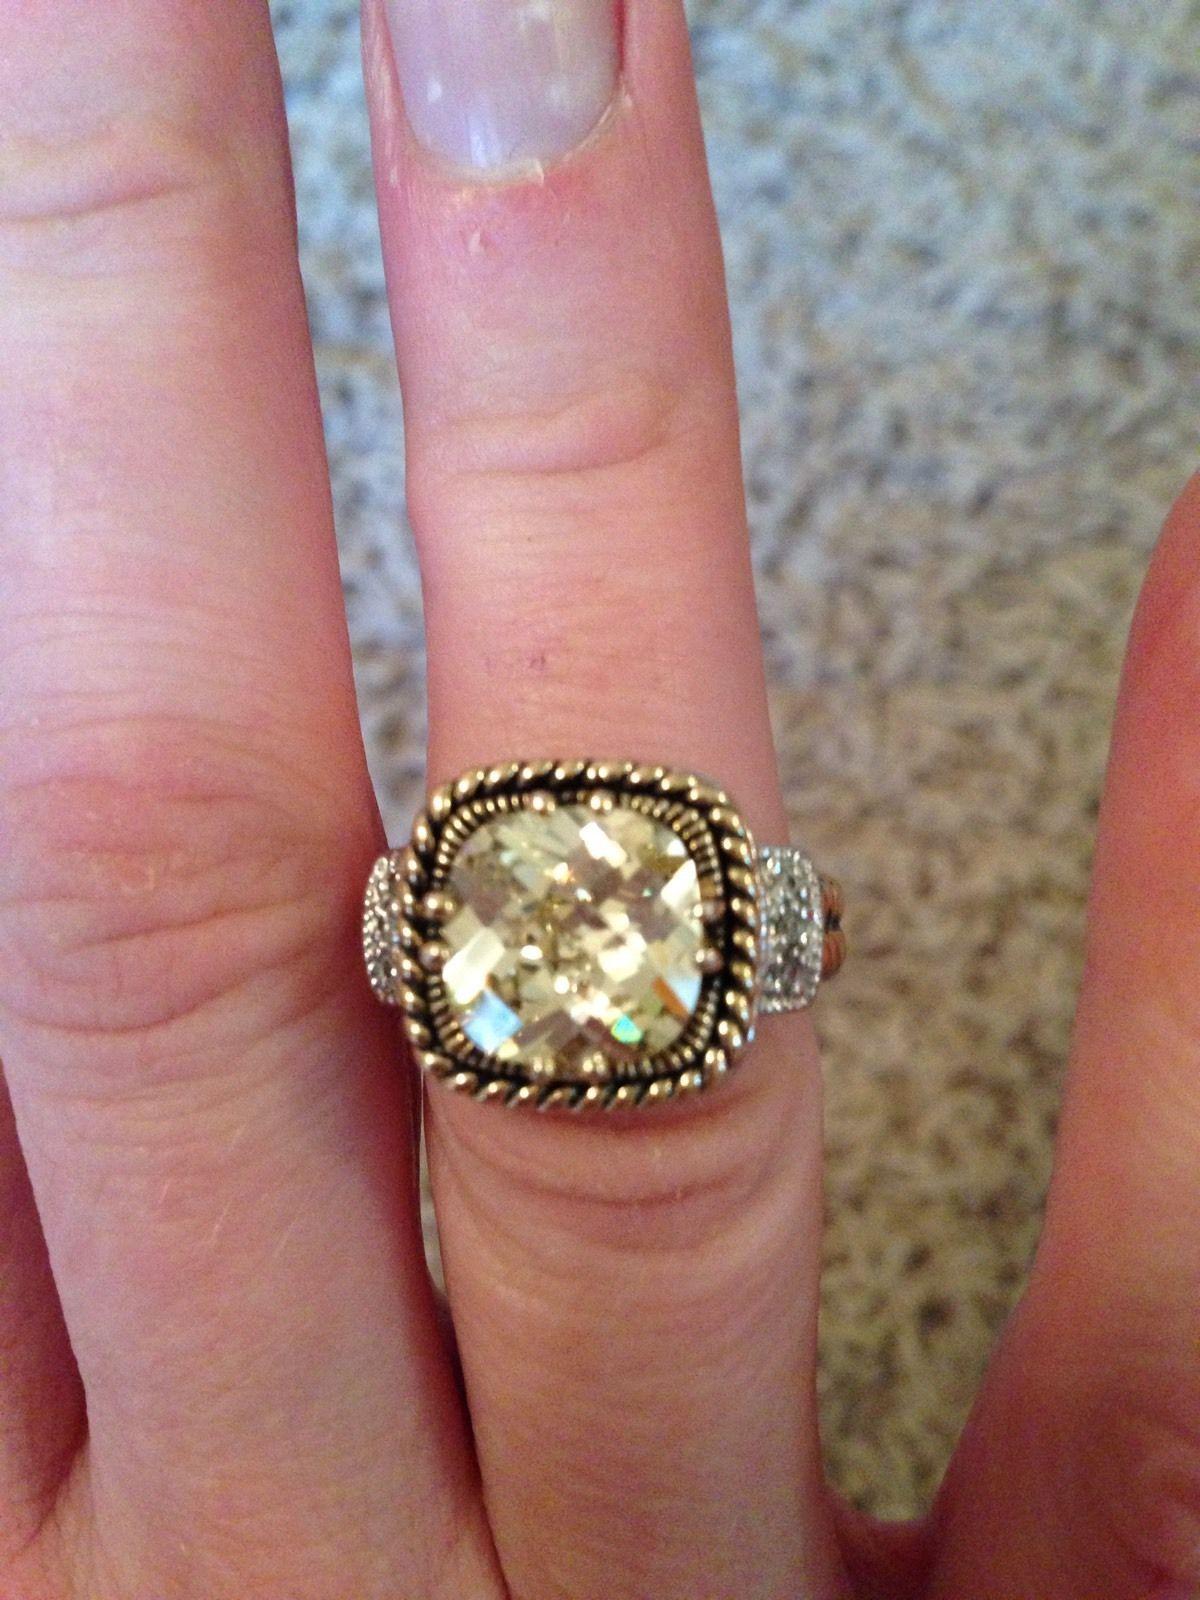 Lia Sophia Lemon Chiffon Ring Size 6 and 50 similar items